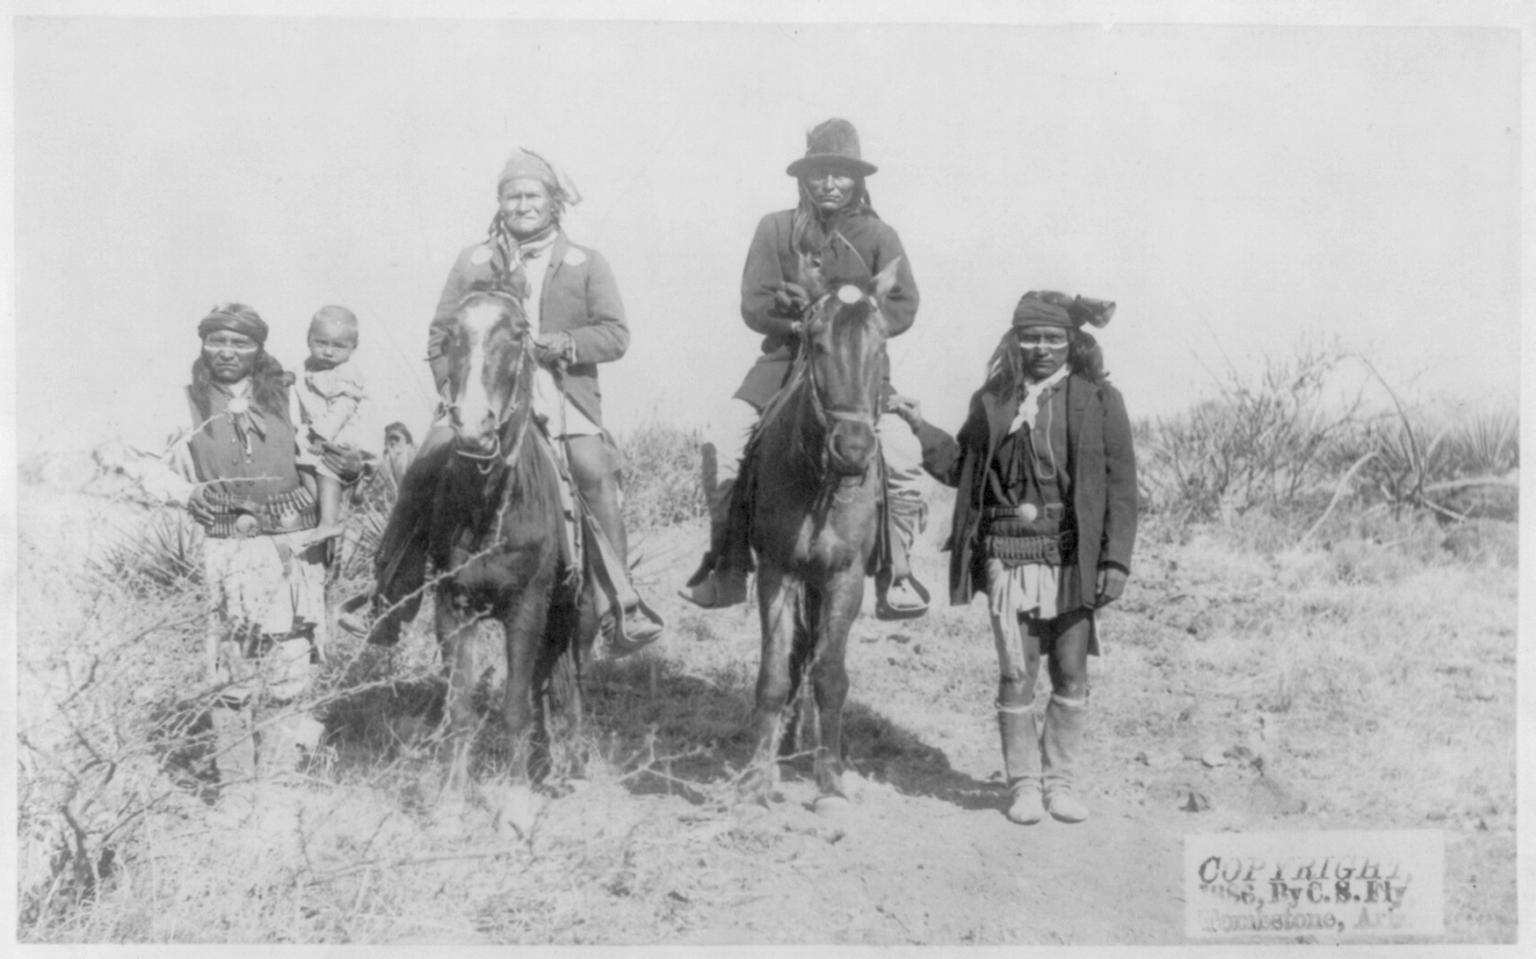 http://upload.wikimedia.org/wikipedia/commons/e/e7/Scene_in_Geronimo%27s_camp_II.png